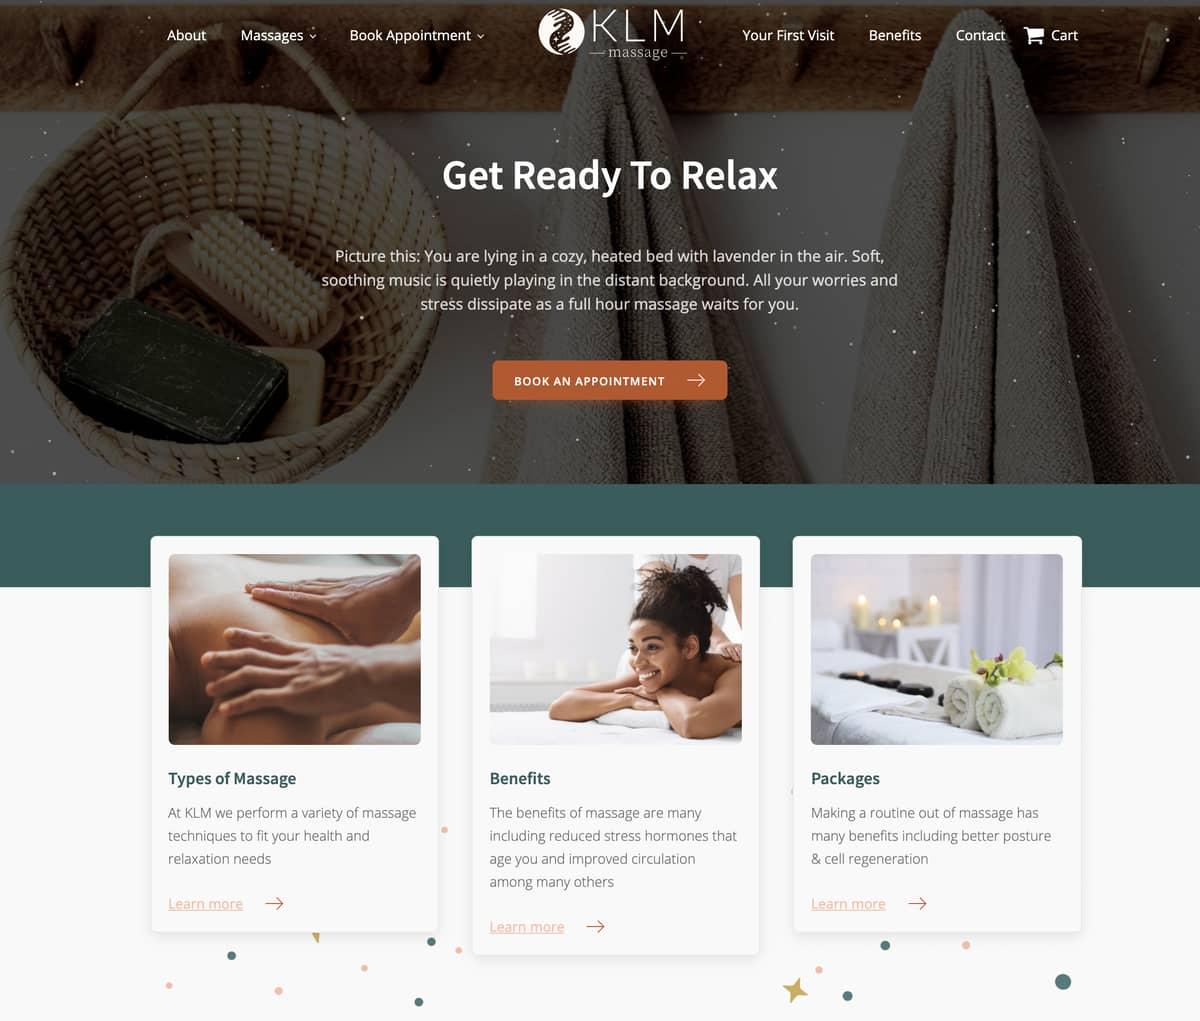 klm_massage